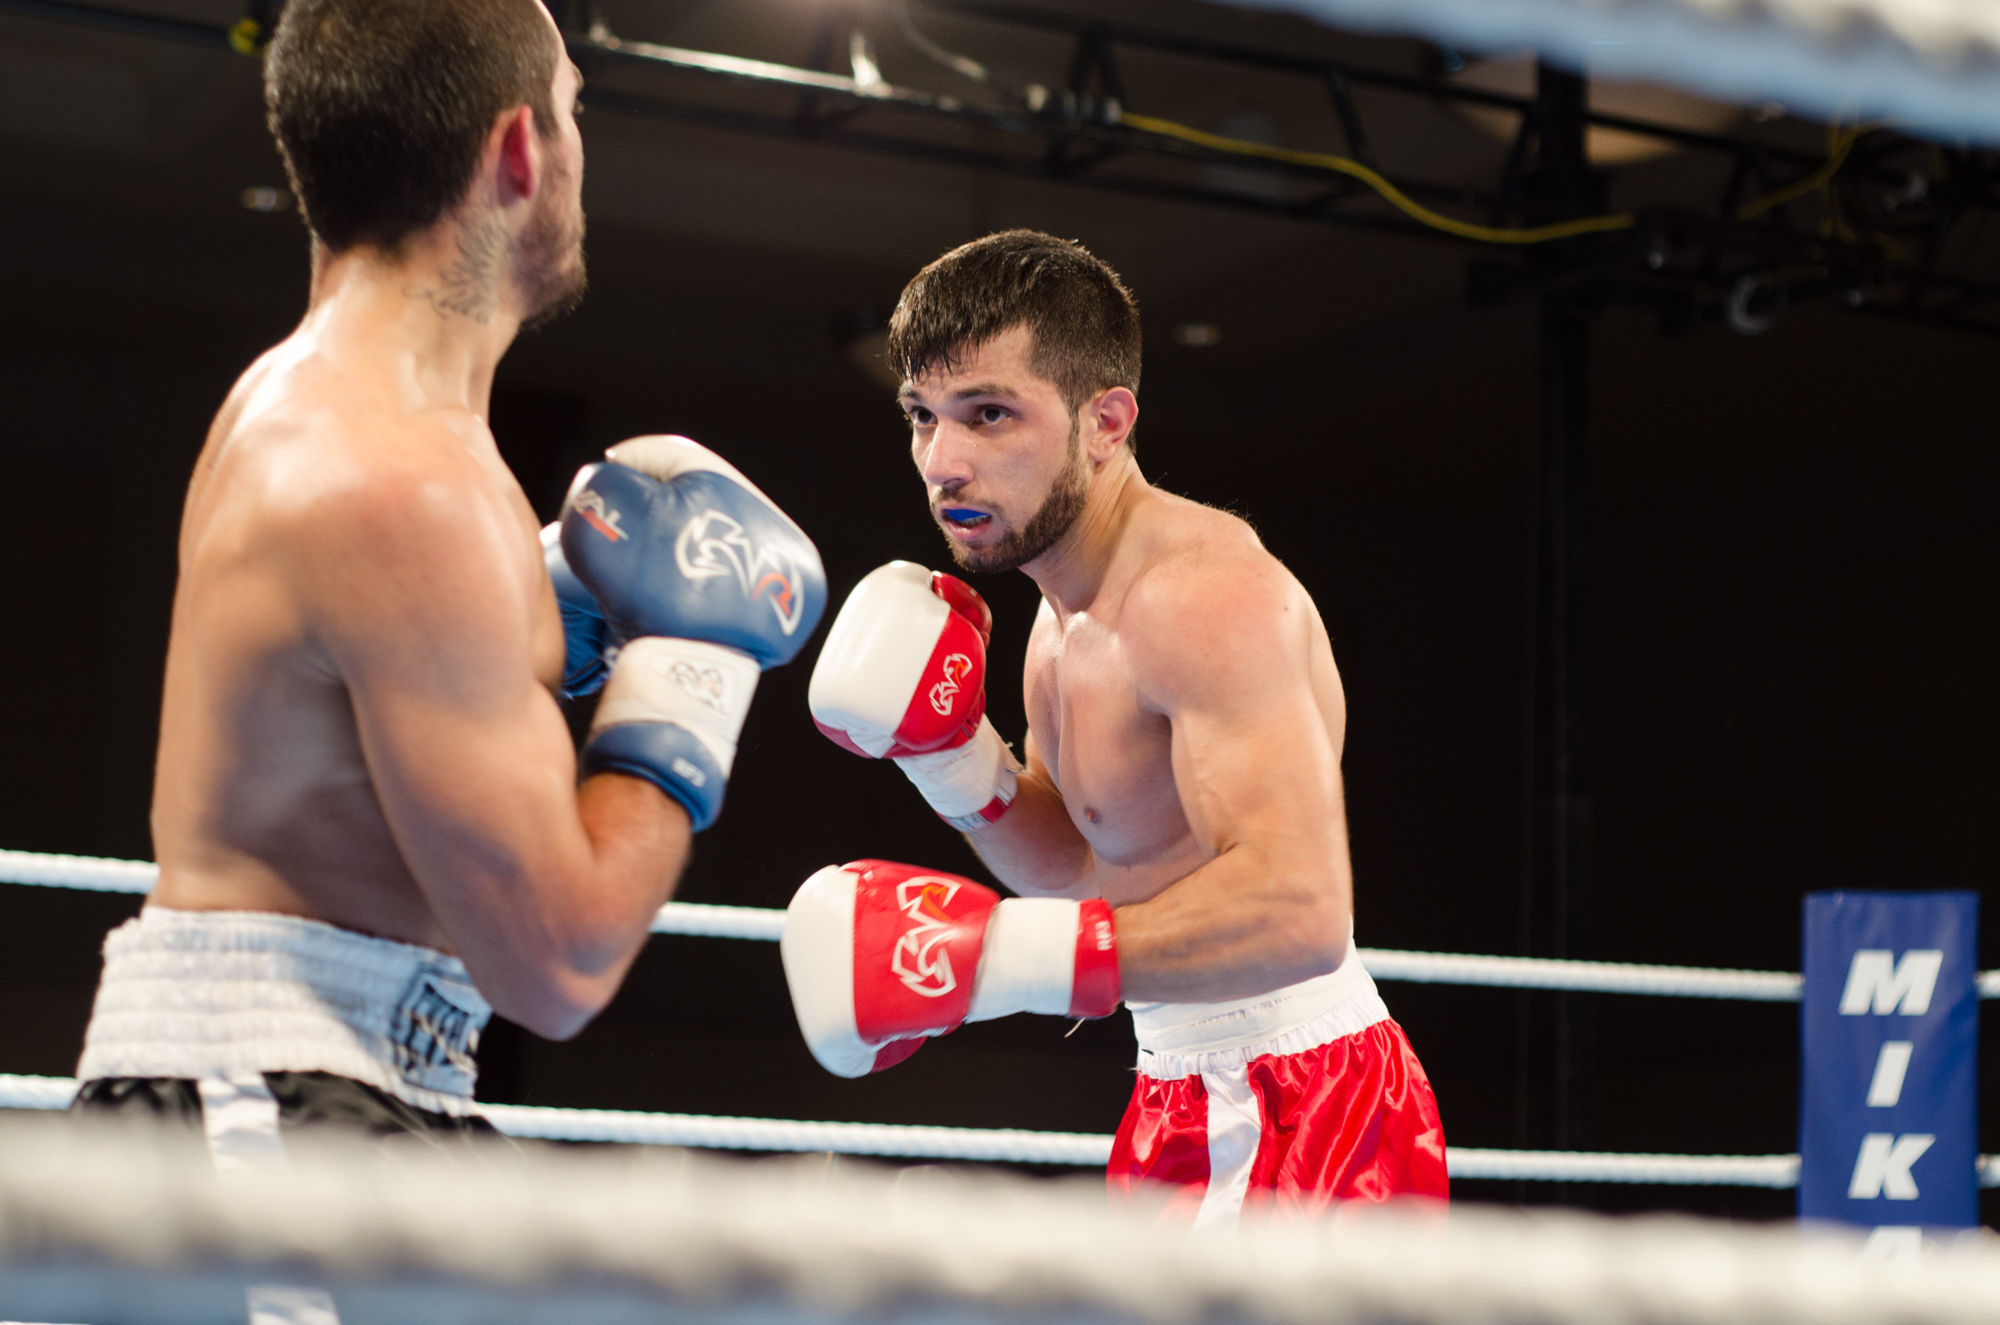 2014 11-6 Ali Fight ICC-106.jpg